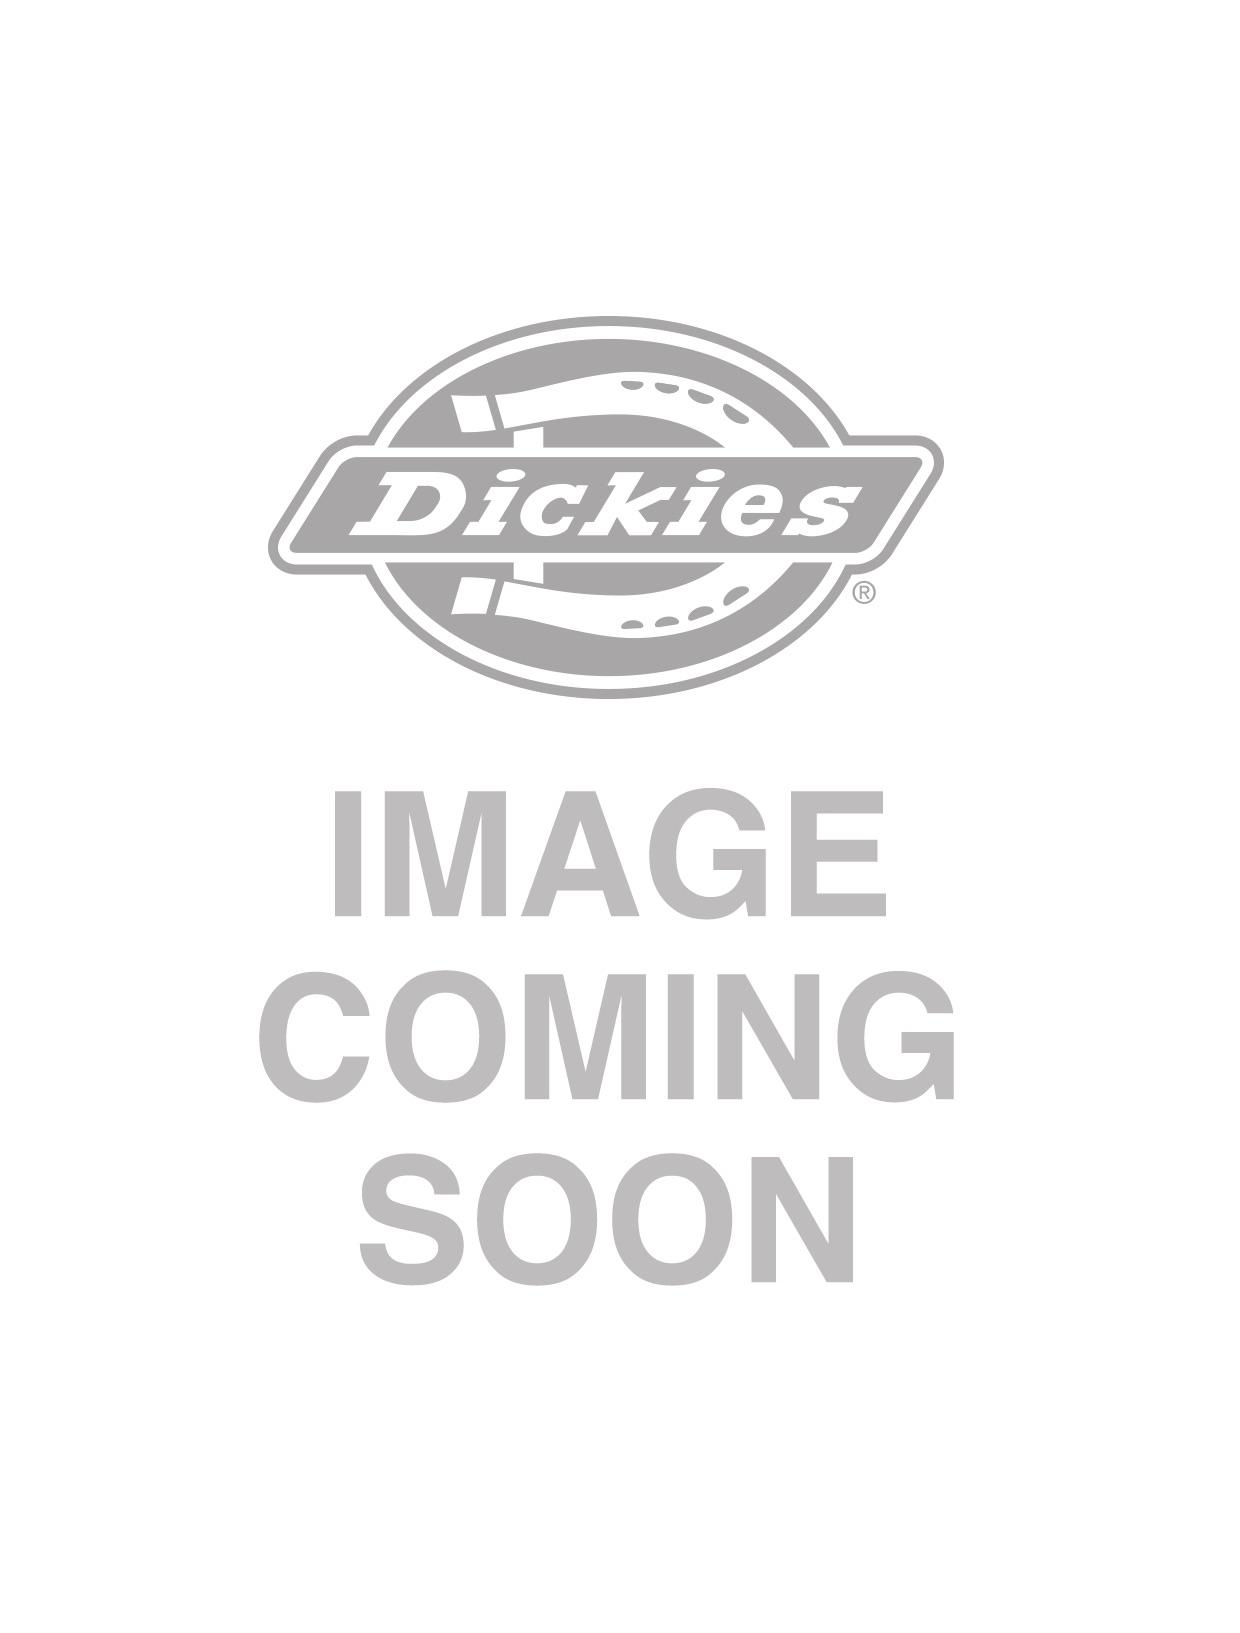 Bettles Bucket Hat